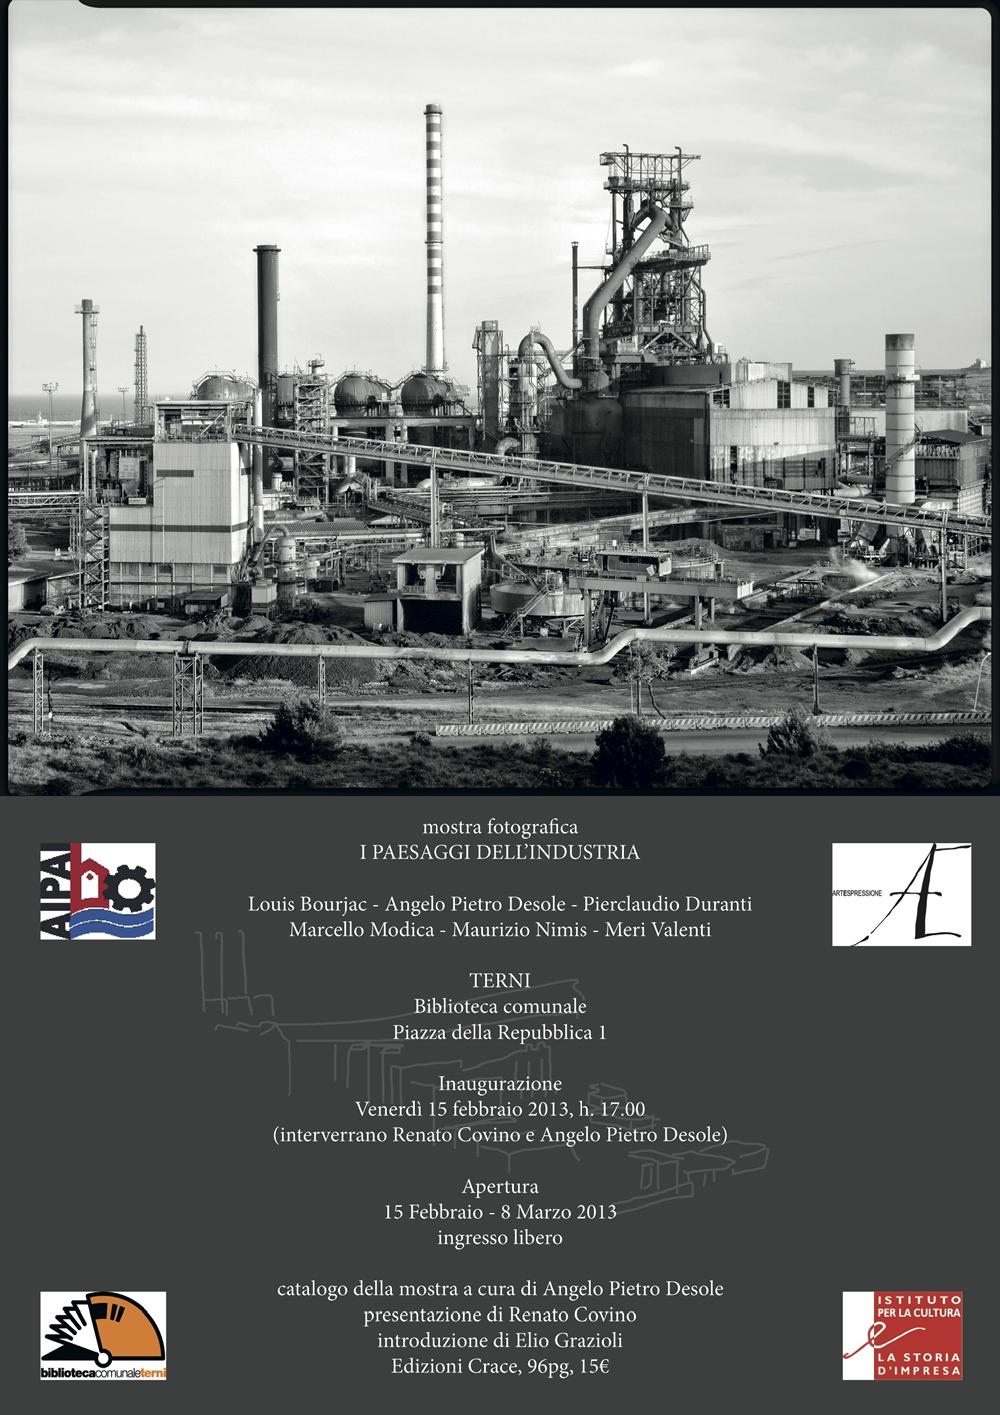 Paesaggi industria - mostra fotografica - Terni 14feb-8mar2013